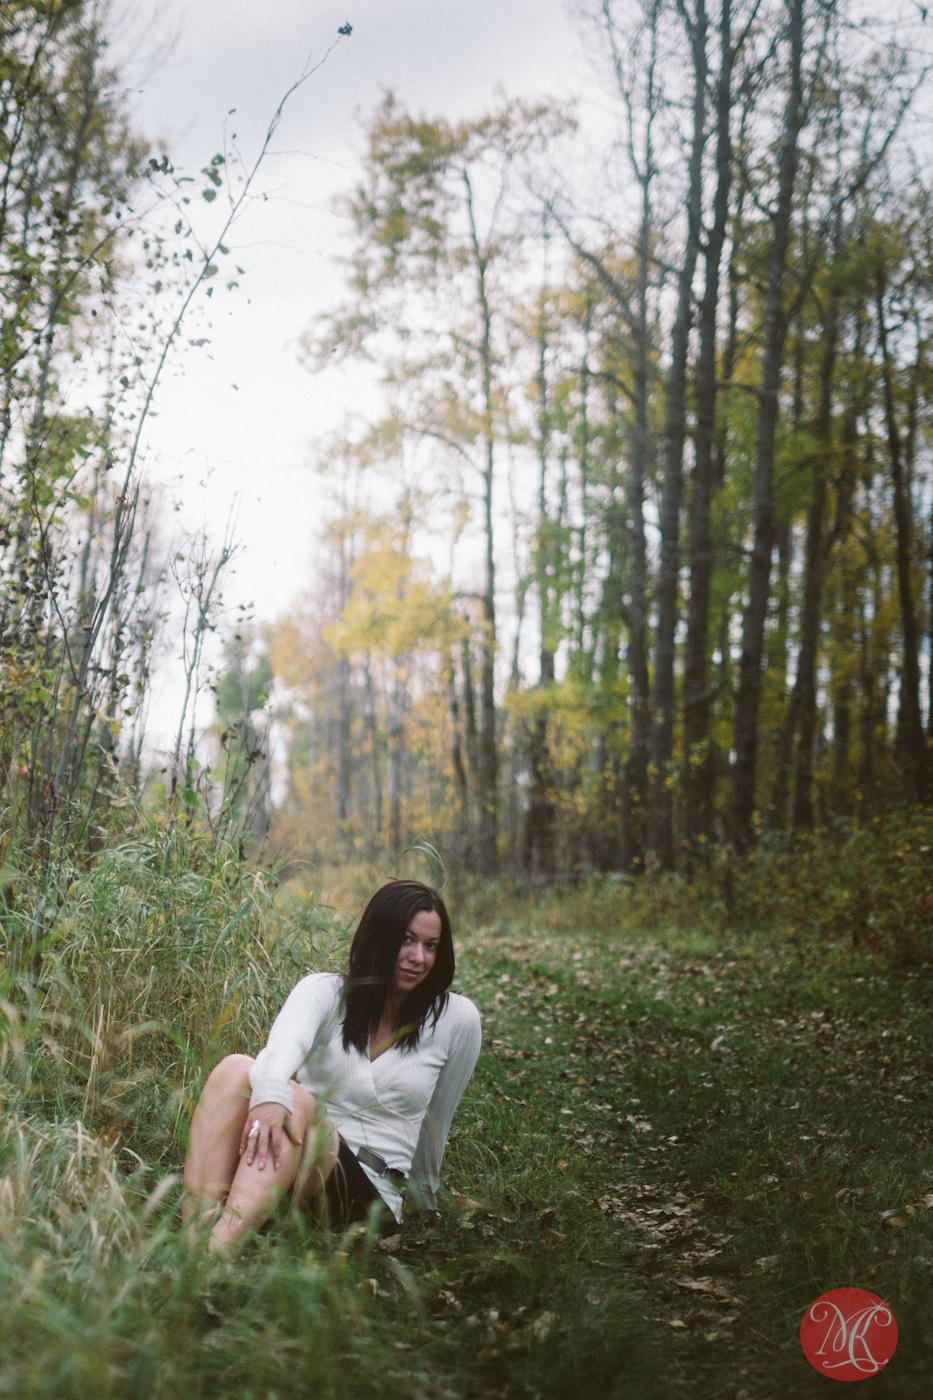 woman path forest sitting edmonton alberta photographer